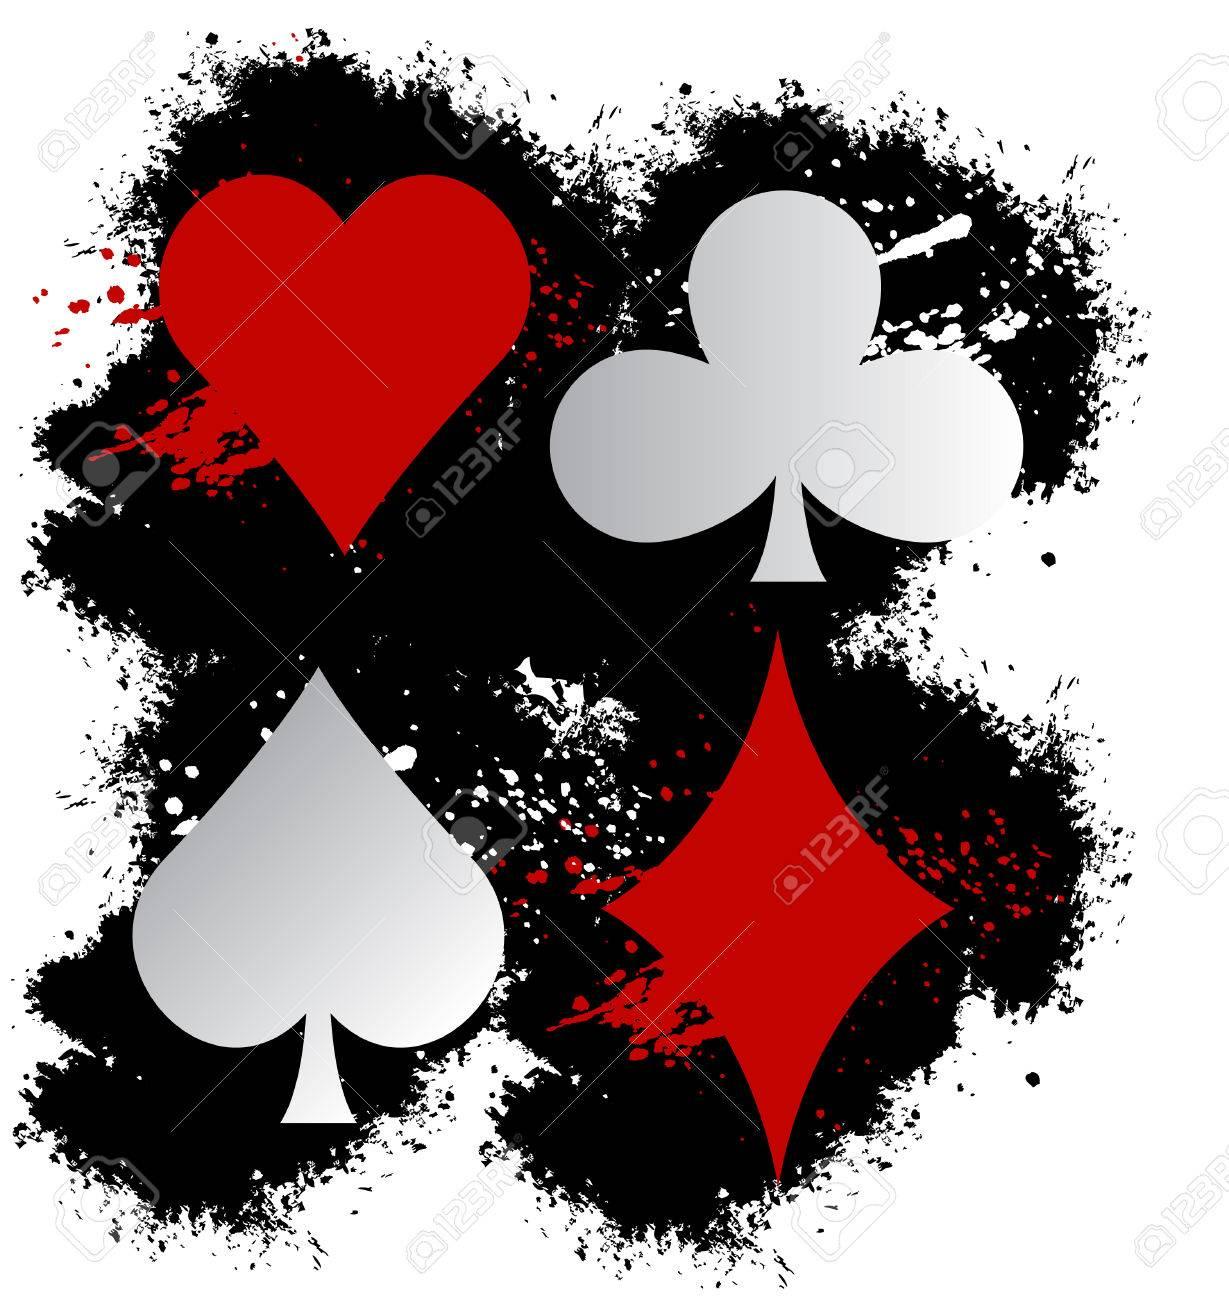 Poker icons Stock Vector - 25591032